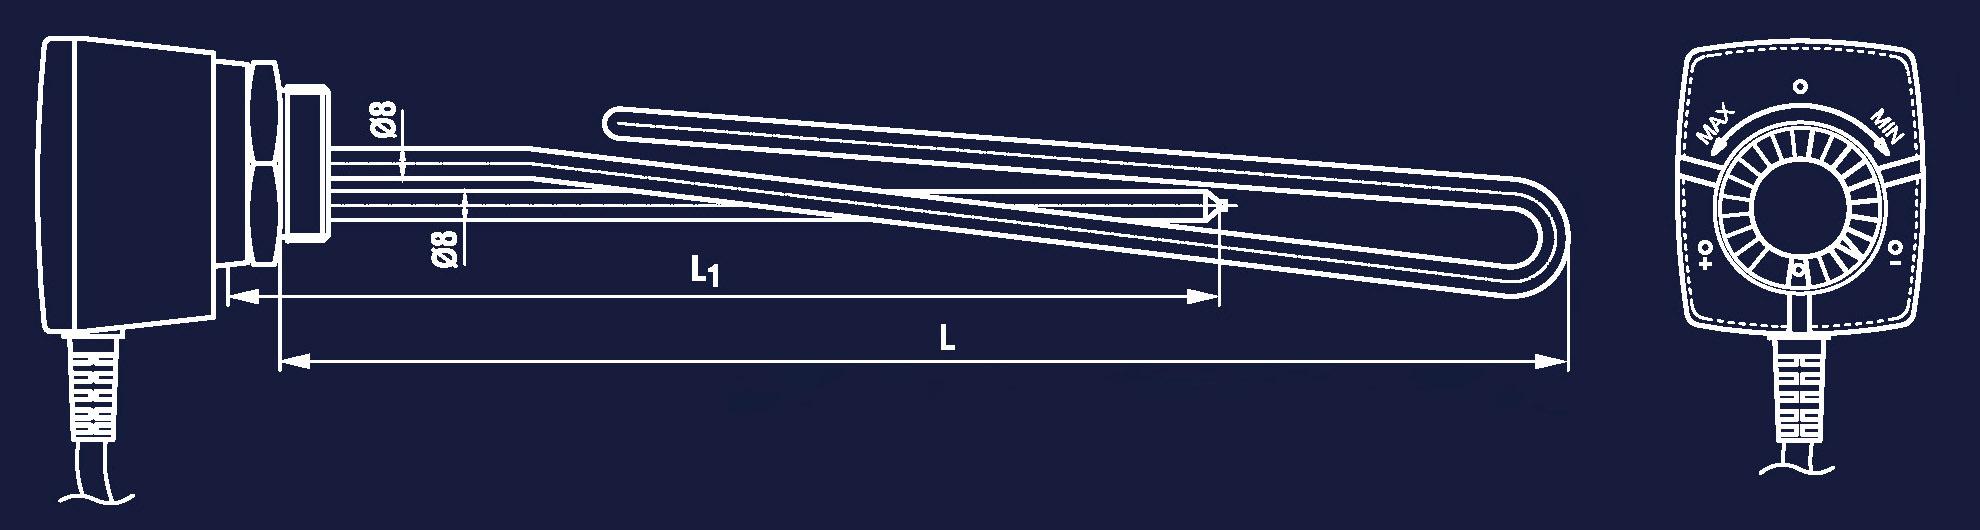 Rysunek grzałki z termoregulatorem 230V 400V WUG MB